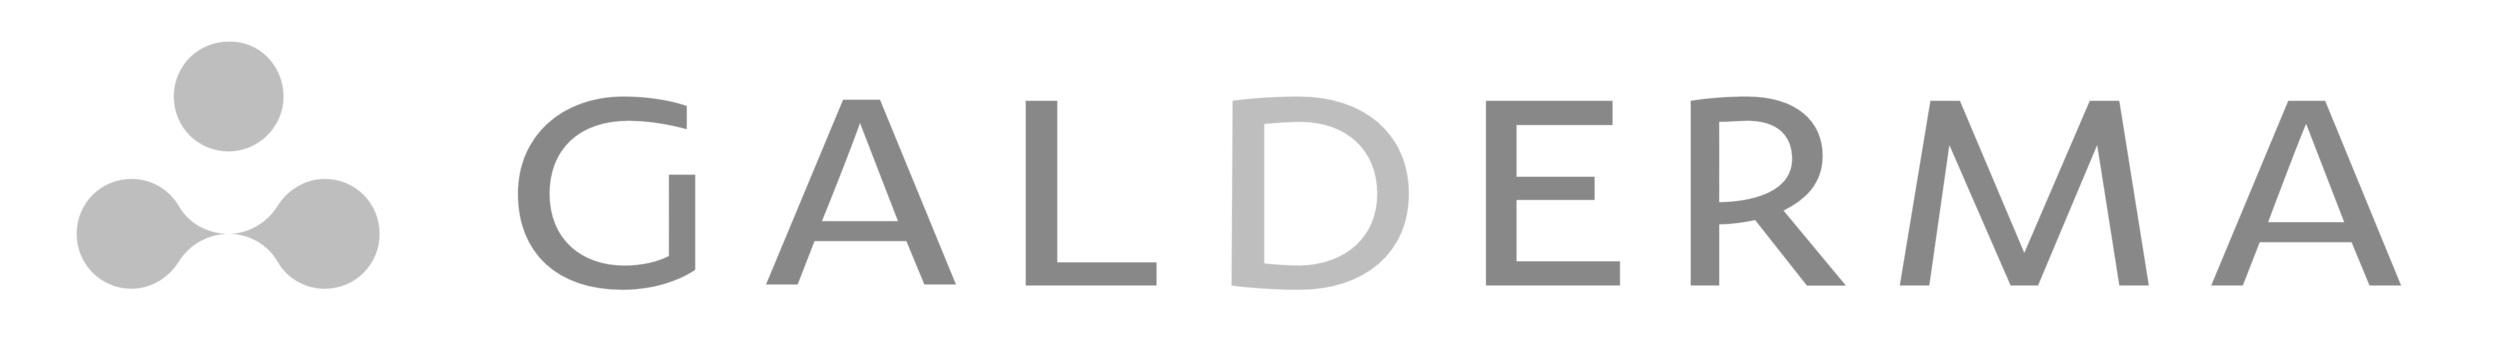 Galderma_logo.png